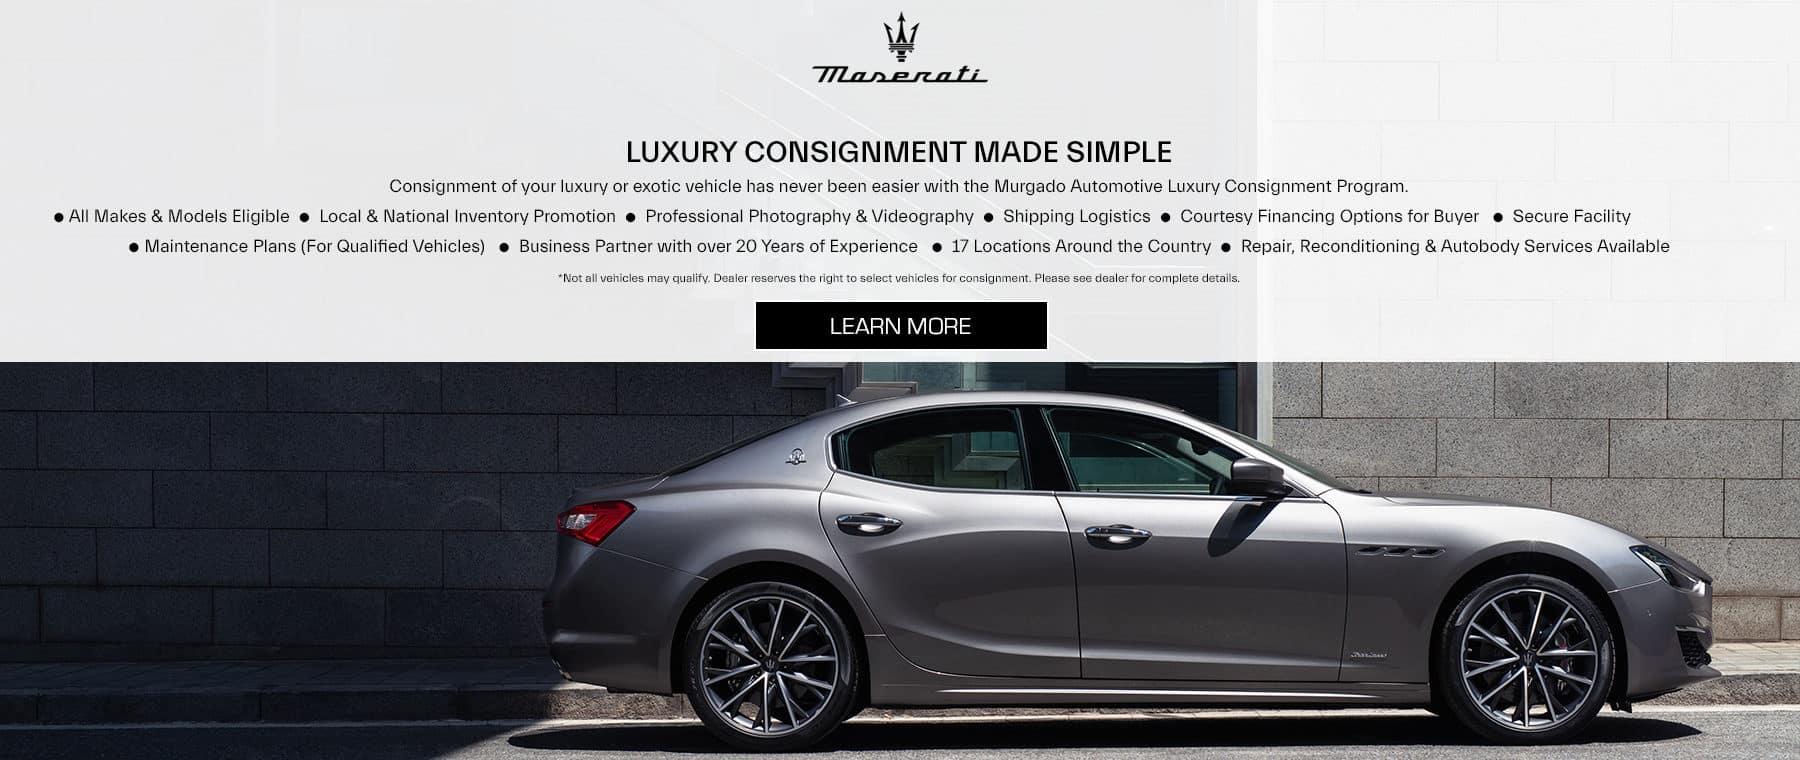 Luxury Consignment gray Maserati sedan